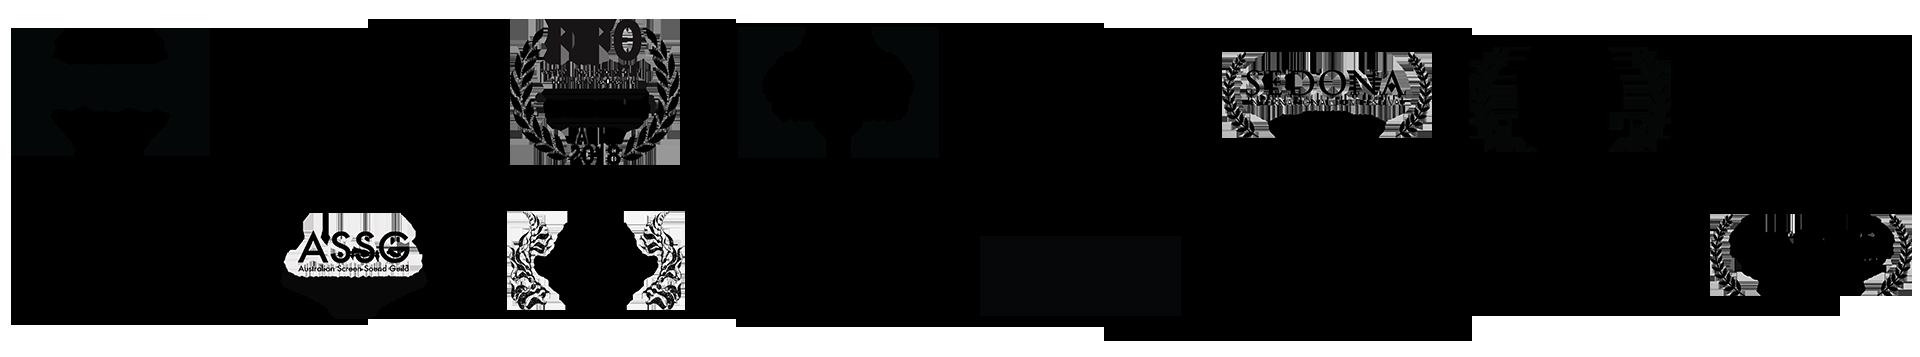 blue-award-winners-banner-black-88.png